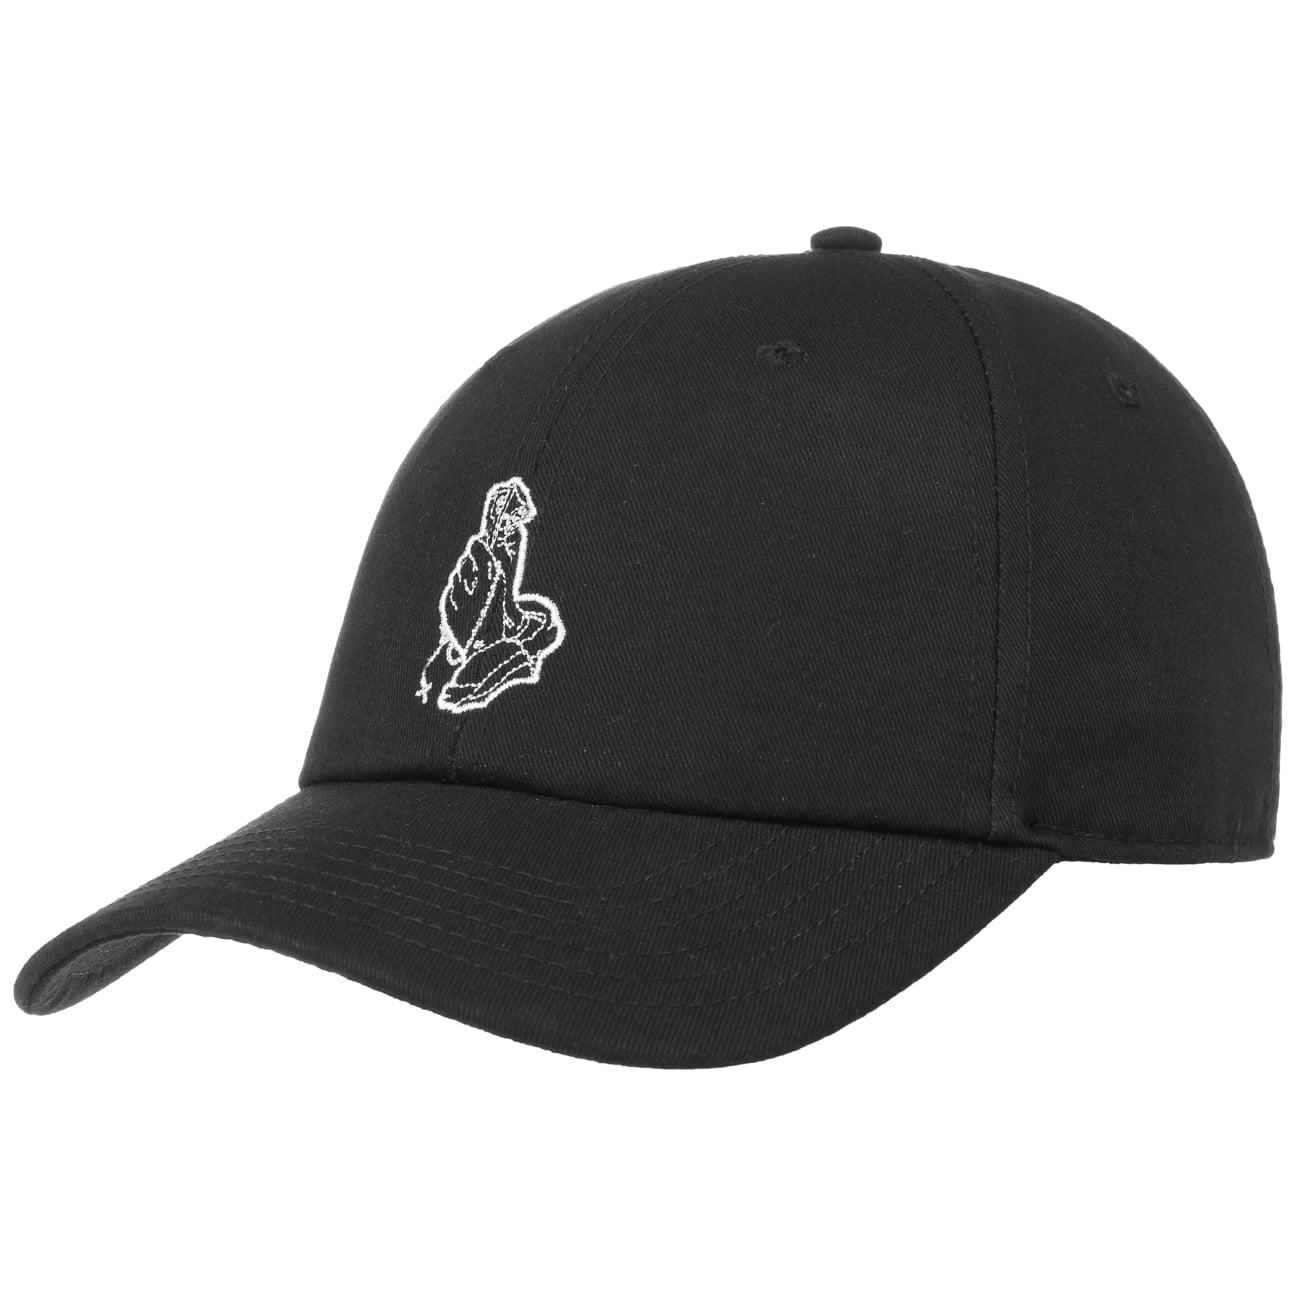 Gorra Blessed Curved by Cayler & Sons  gorra de baseball